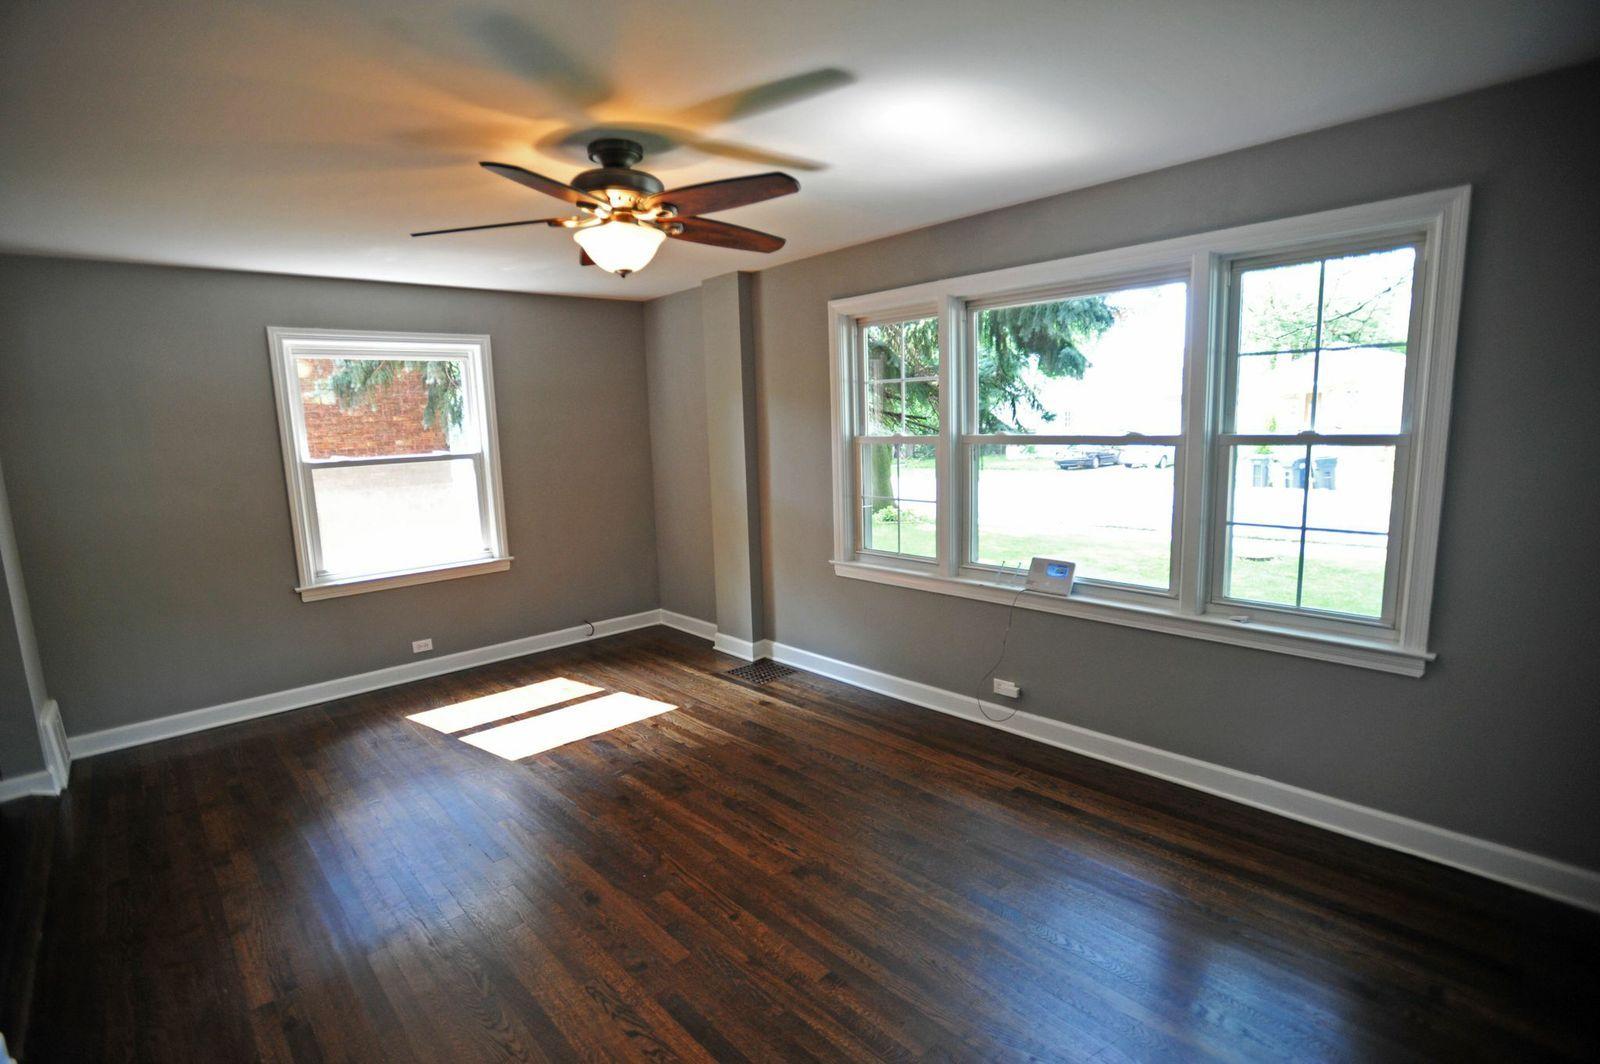 Length Laminate Flooring (641.9 Sq. Ft. / Pallet) LF000448   The Home Depot  | Pinterest | Pallu2026